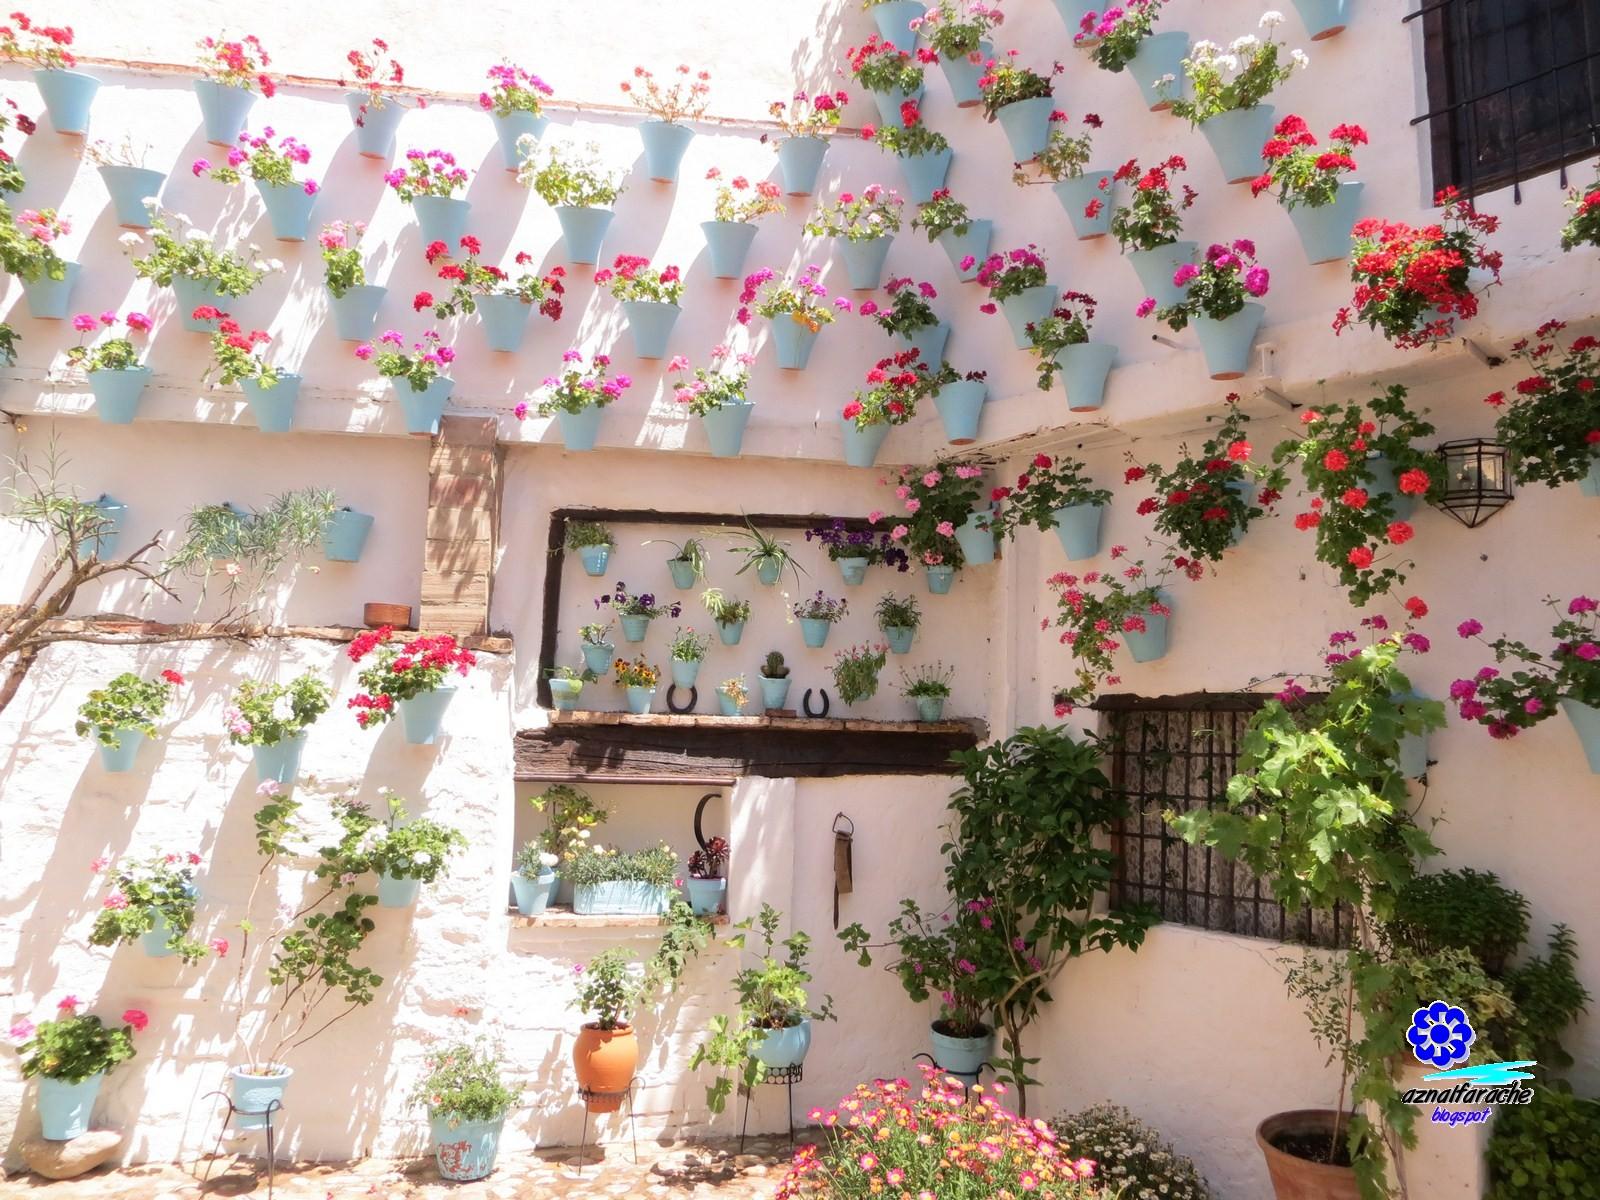 Los patios de c rdoba un tesoro de la sabidur a popular for Azulejeria antigua cordoba